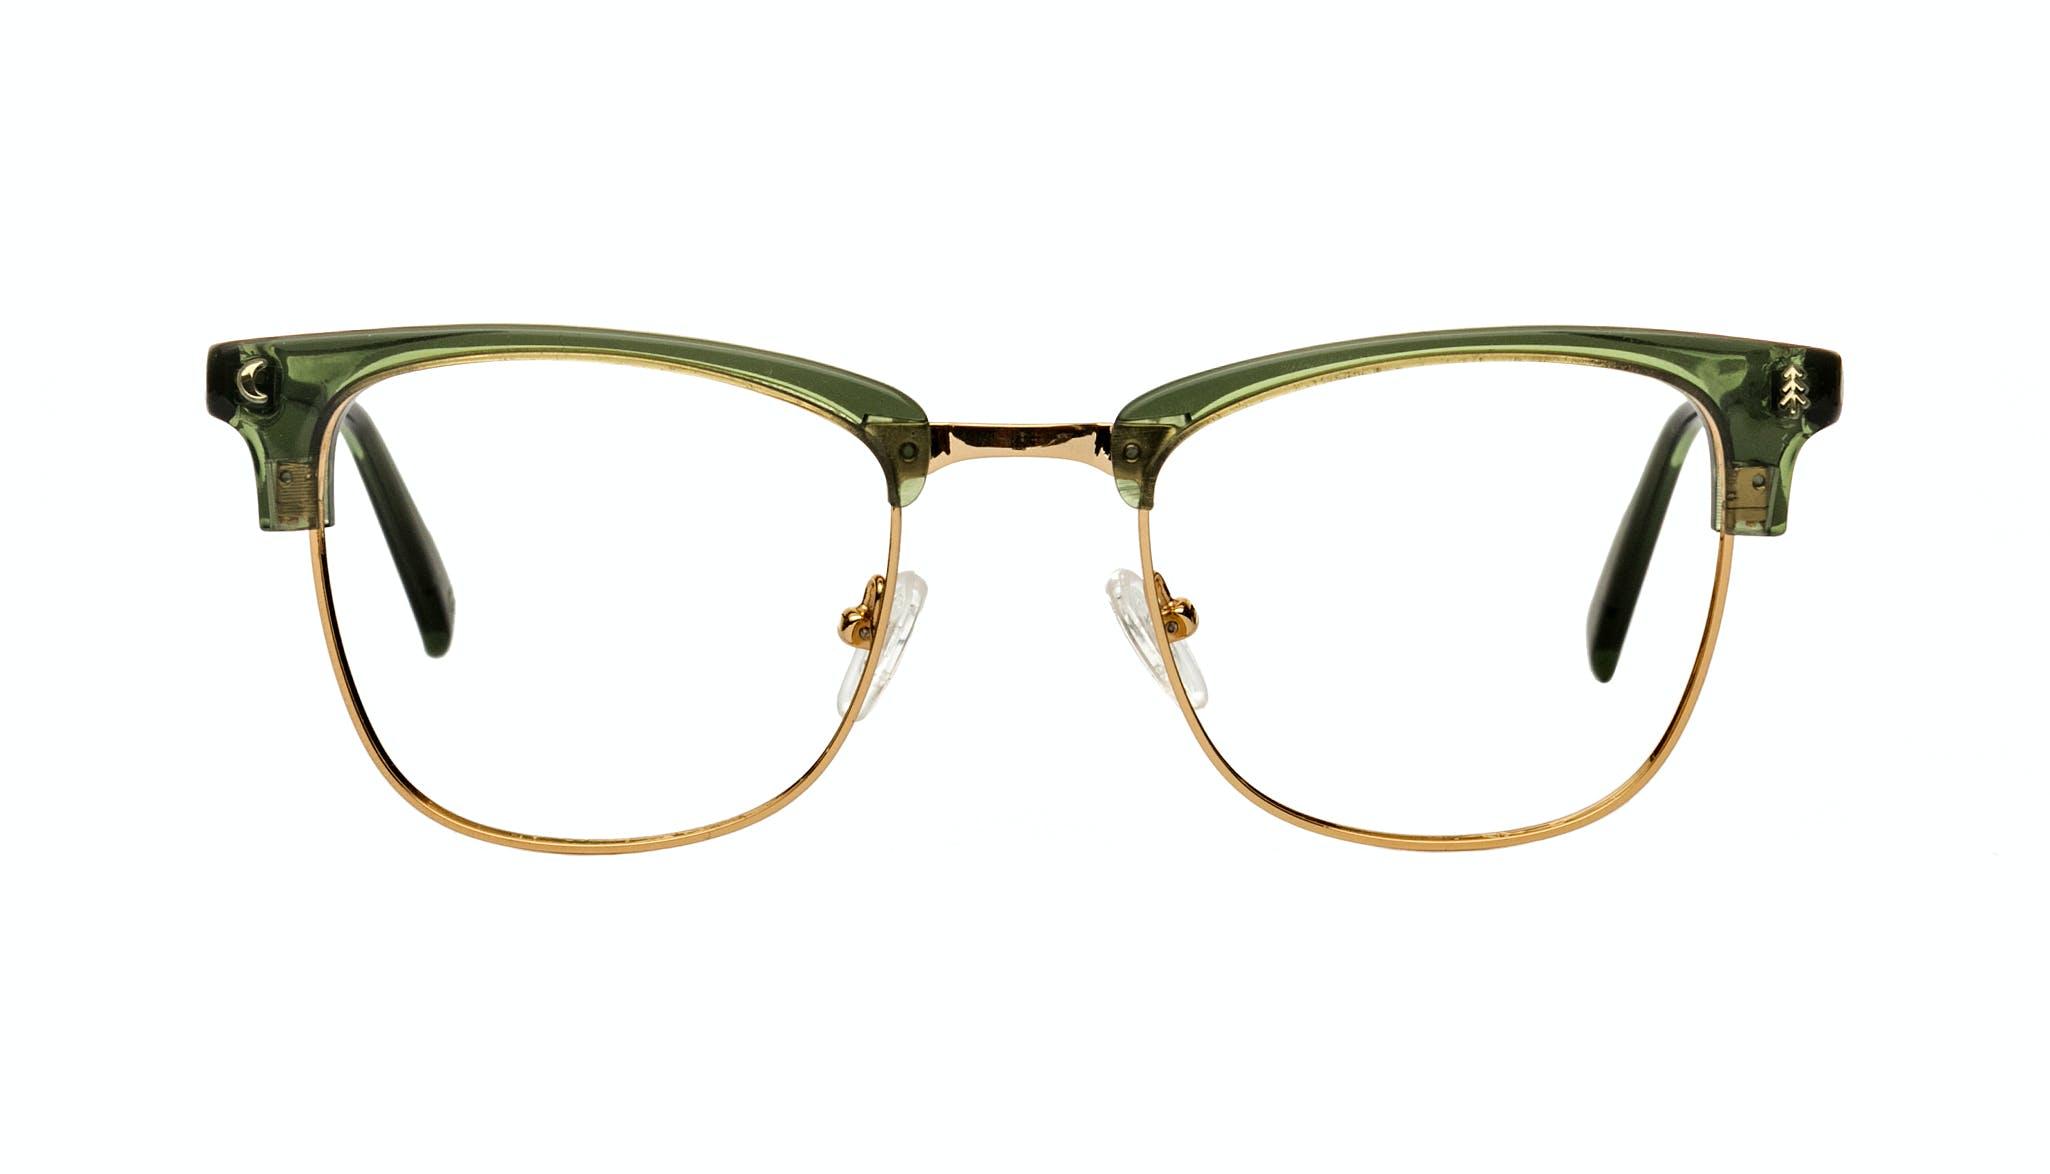 Affordable Fashion Glasses Rectangle Square Eyeglasses Women Stargazer Moss Green Front